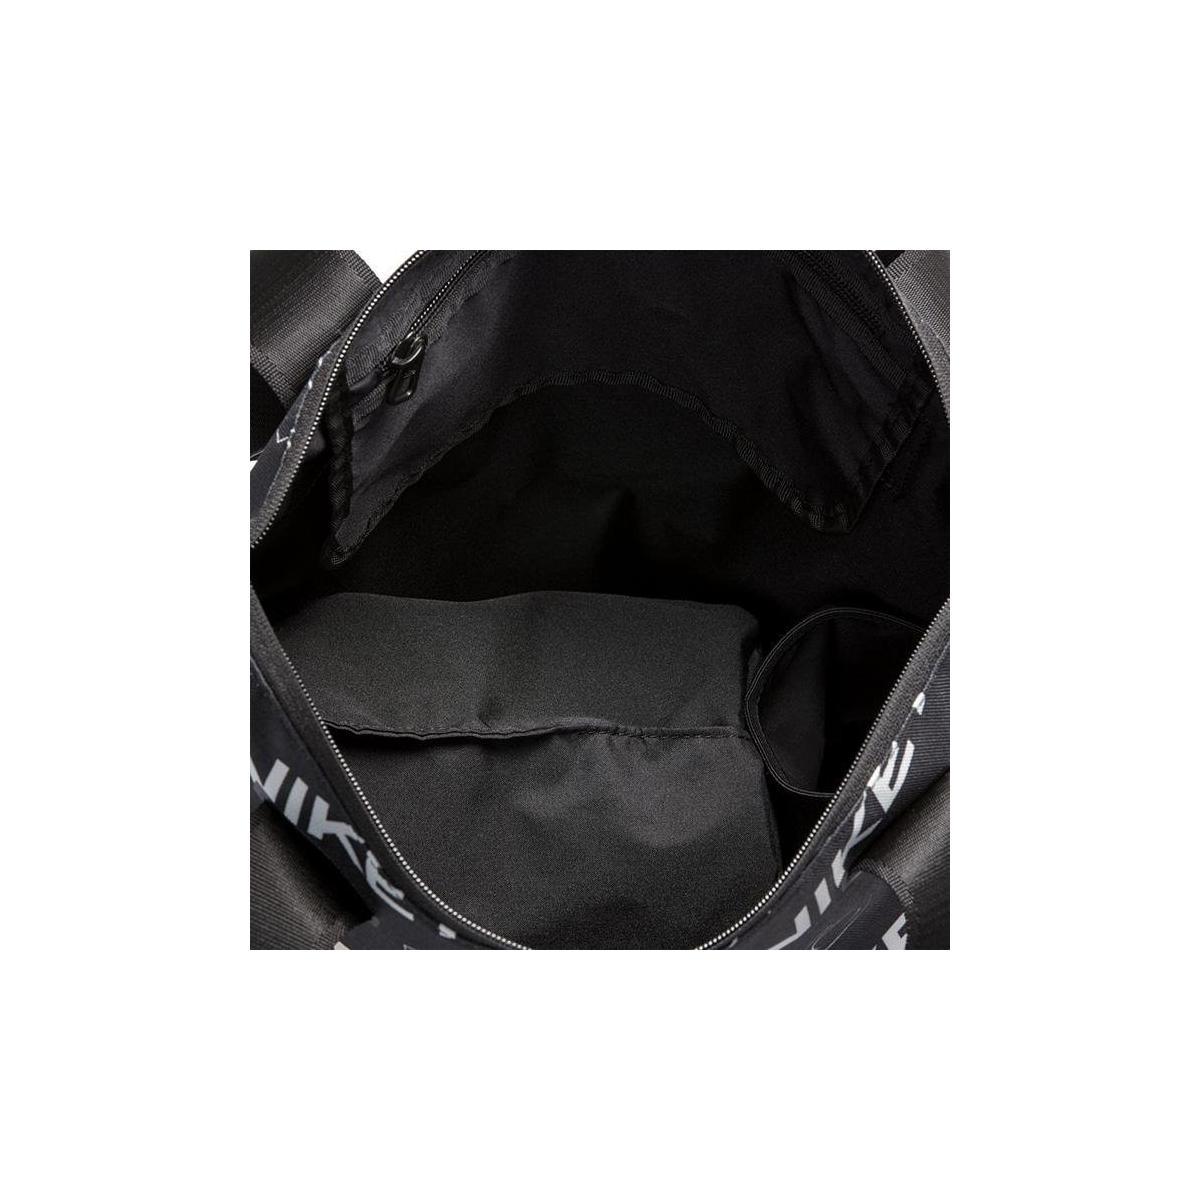 Zaino Nike Sportswear Heritage 2.0 con logo all over unisex rif. CQ6298